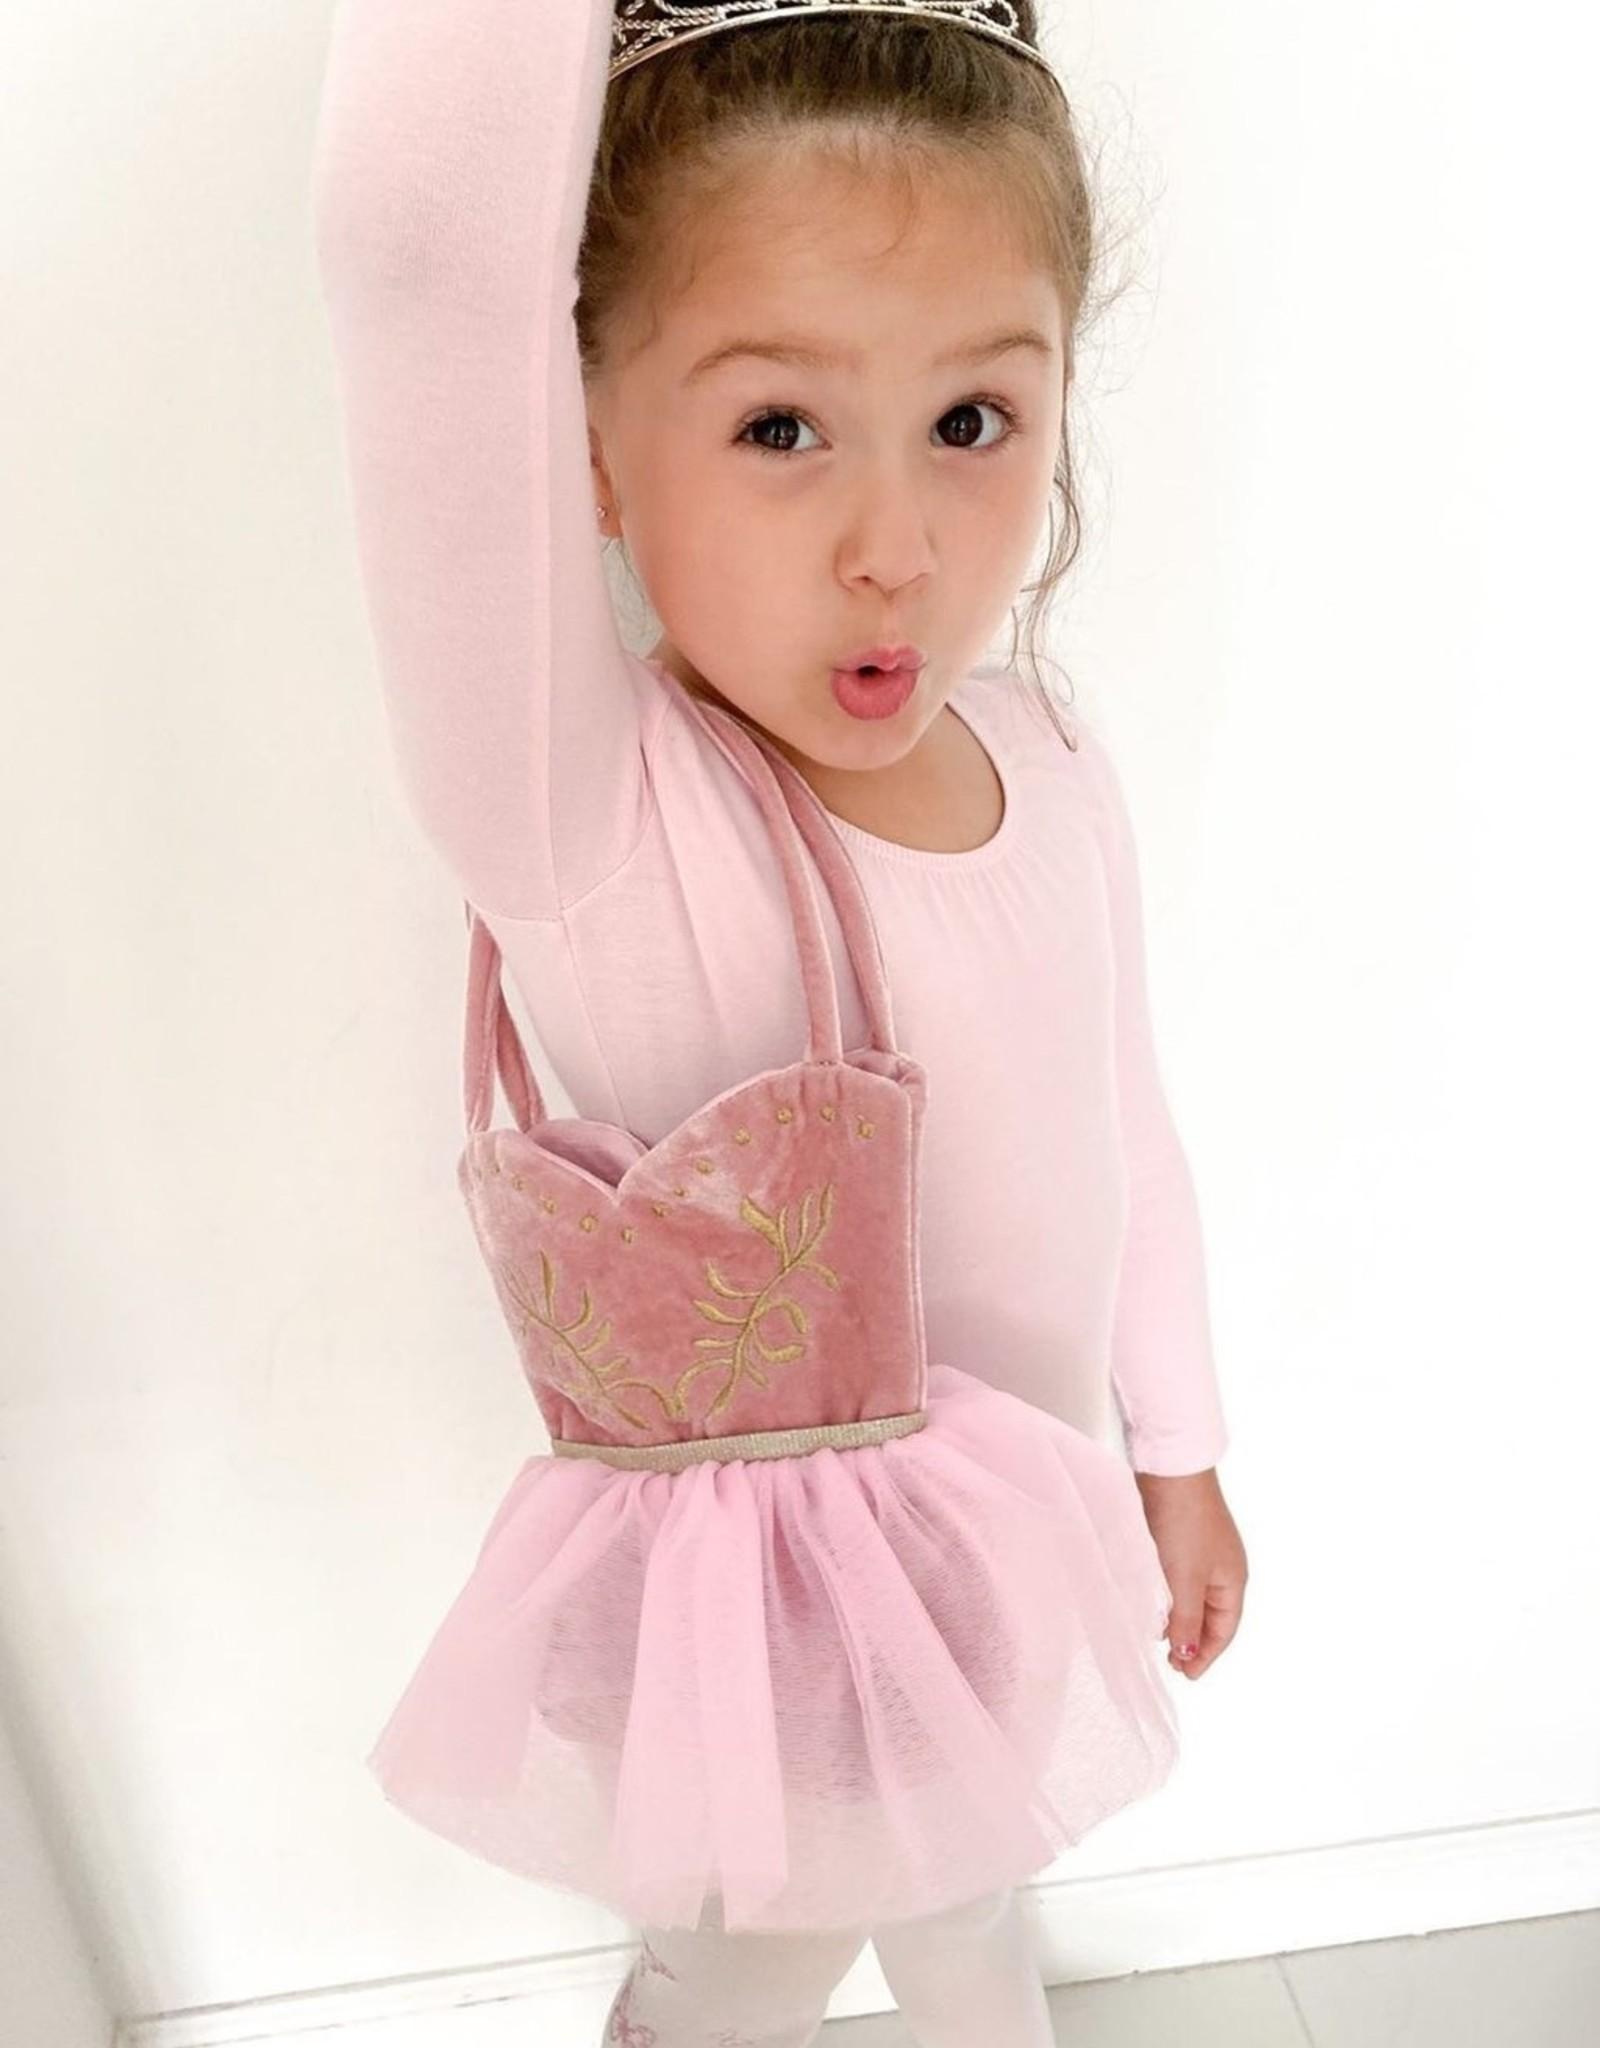 Mon Ami Ballerina Tutu Purse